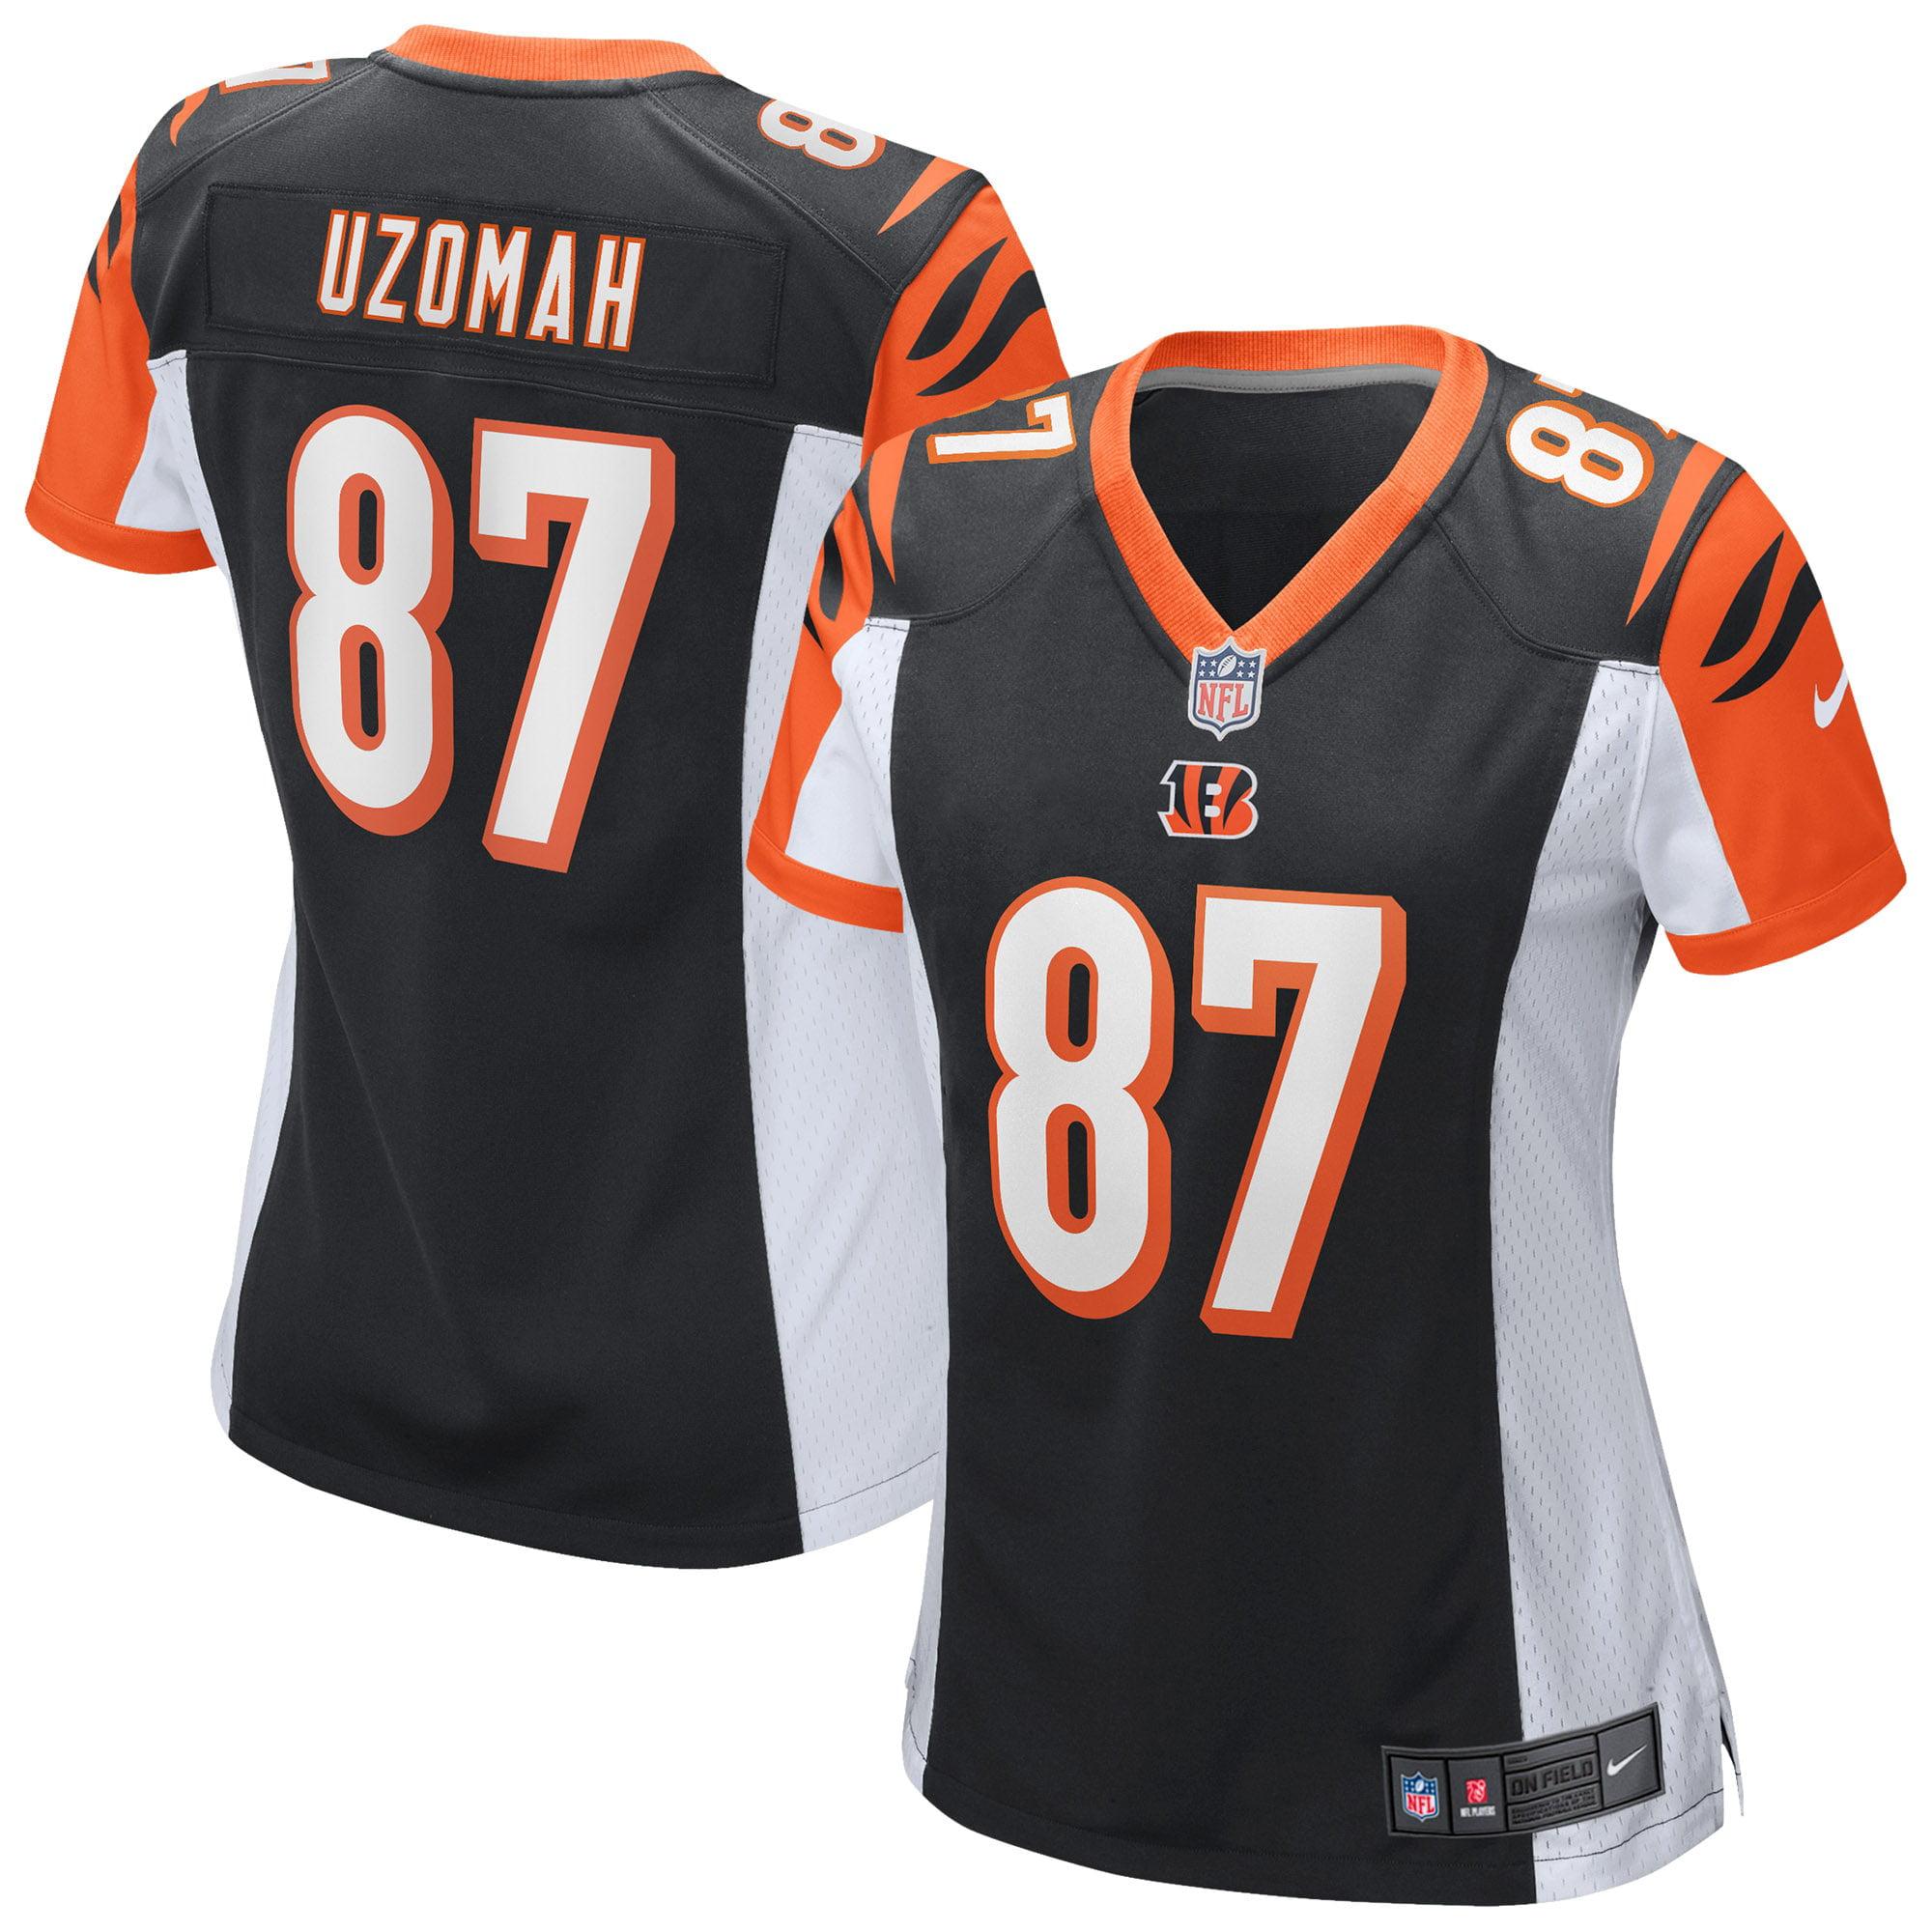 C.J. Uzomah Cincinnati Bengals Nike Women's Game Jersey - Black - Walmart.com